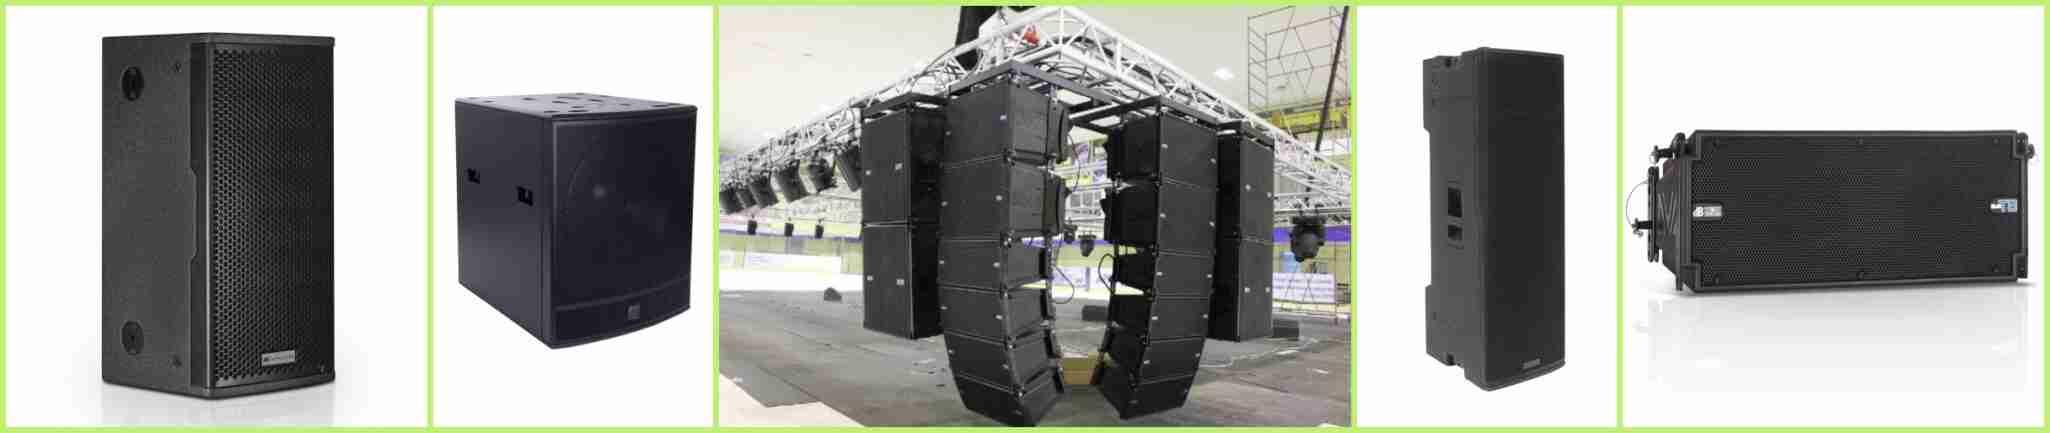 impianti audio per eventi